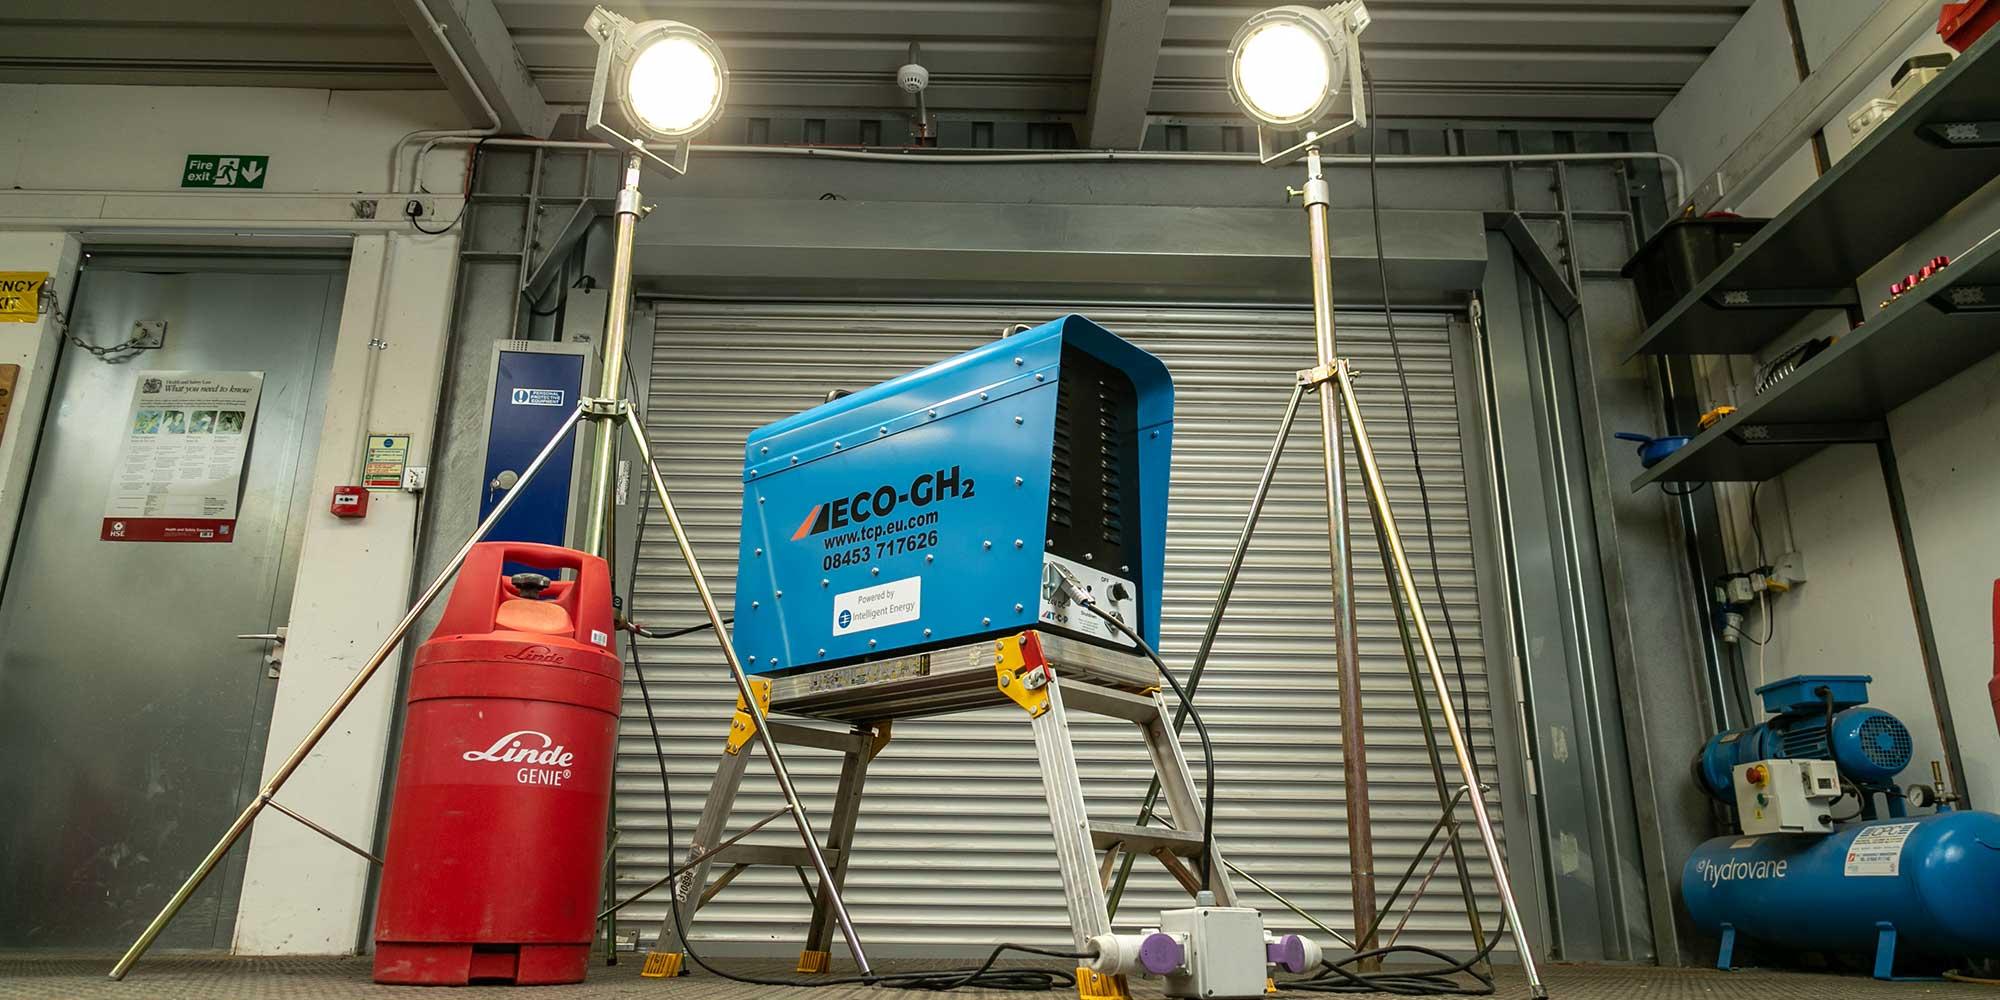 Ecolite GH2 Hydrogen DC power generator